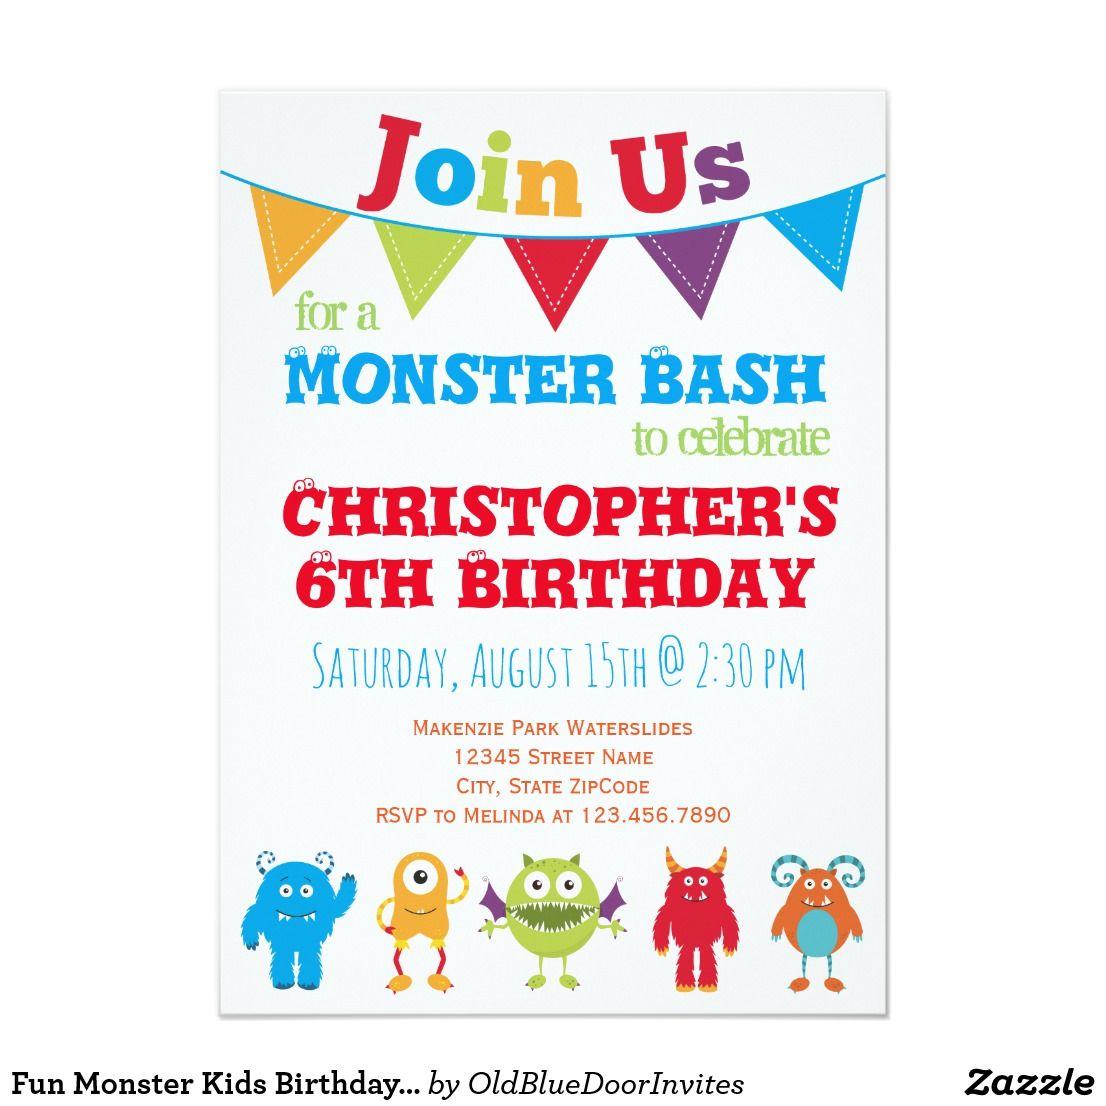 Fun Monster Kids Birthday Party Invitations   Pinterest   Kids ...